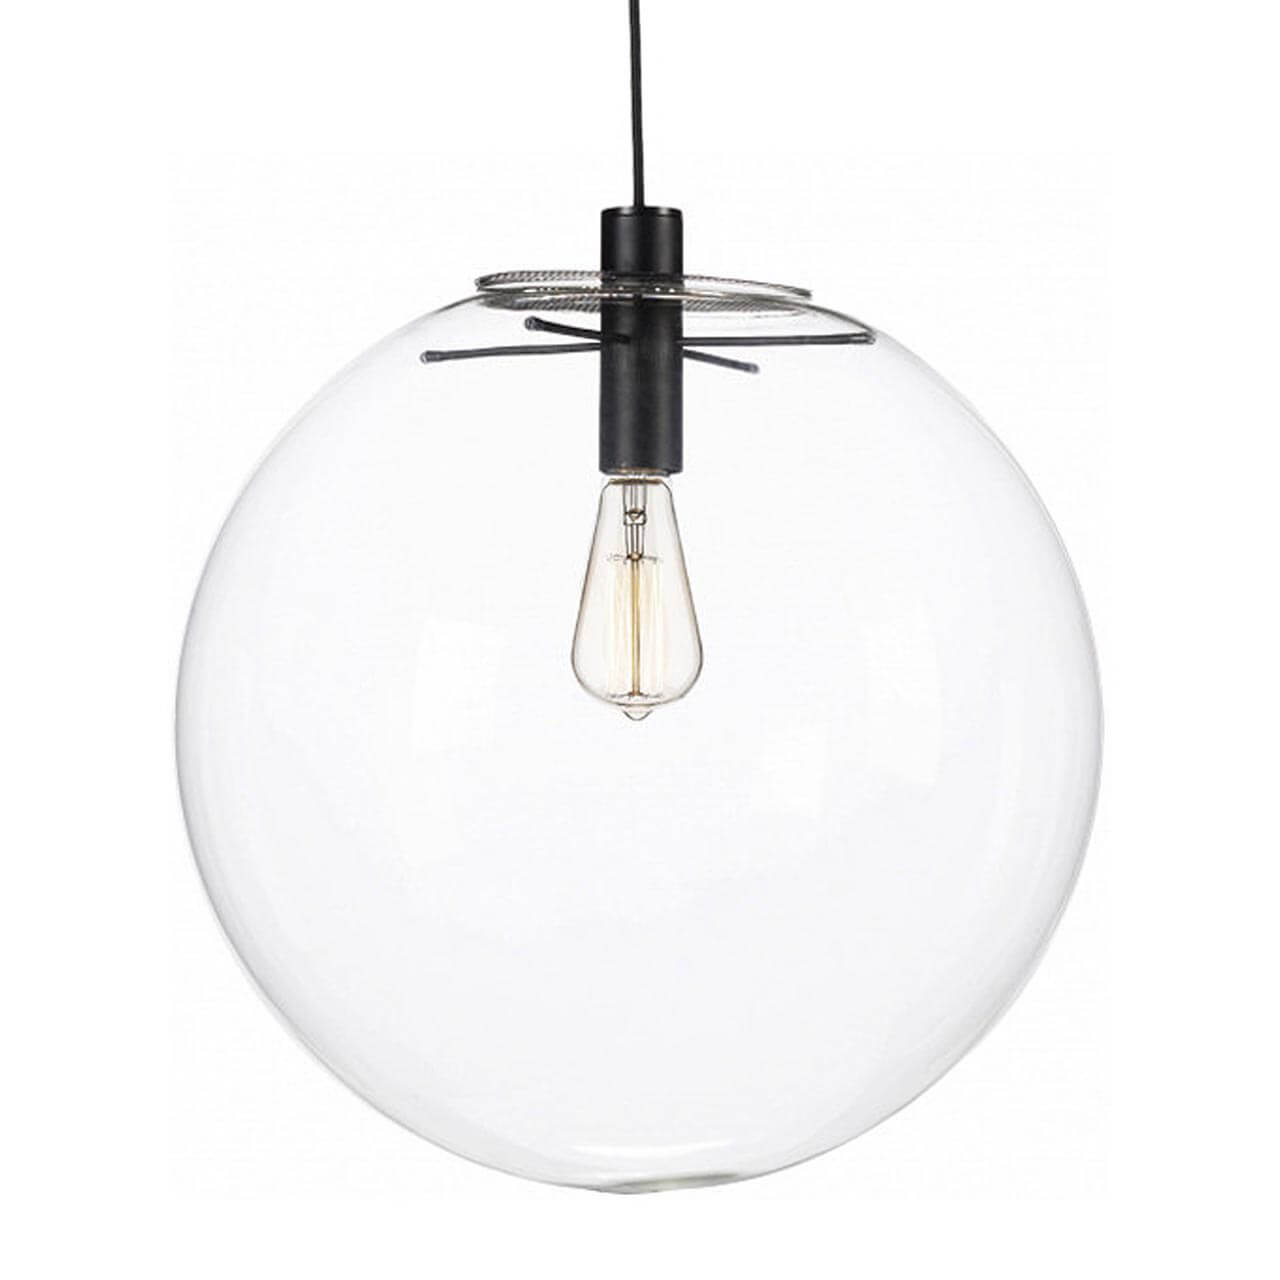 цена на Светильник Kink Light 07562-35,21 Меркурий